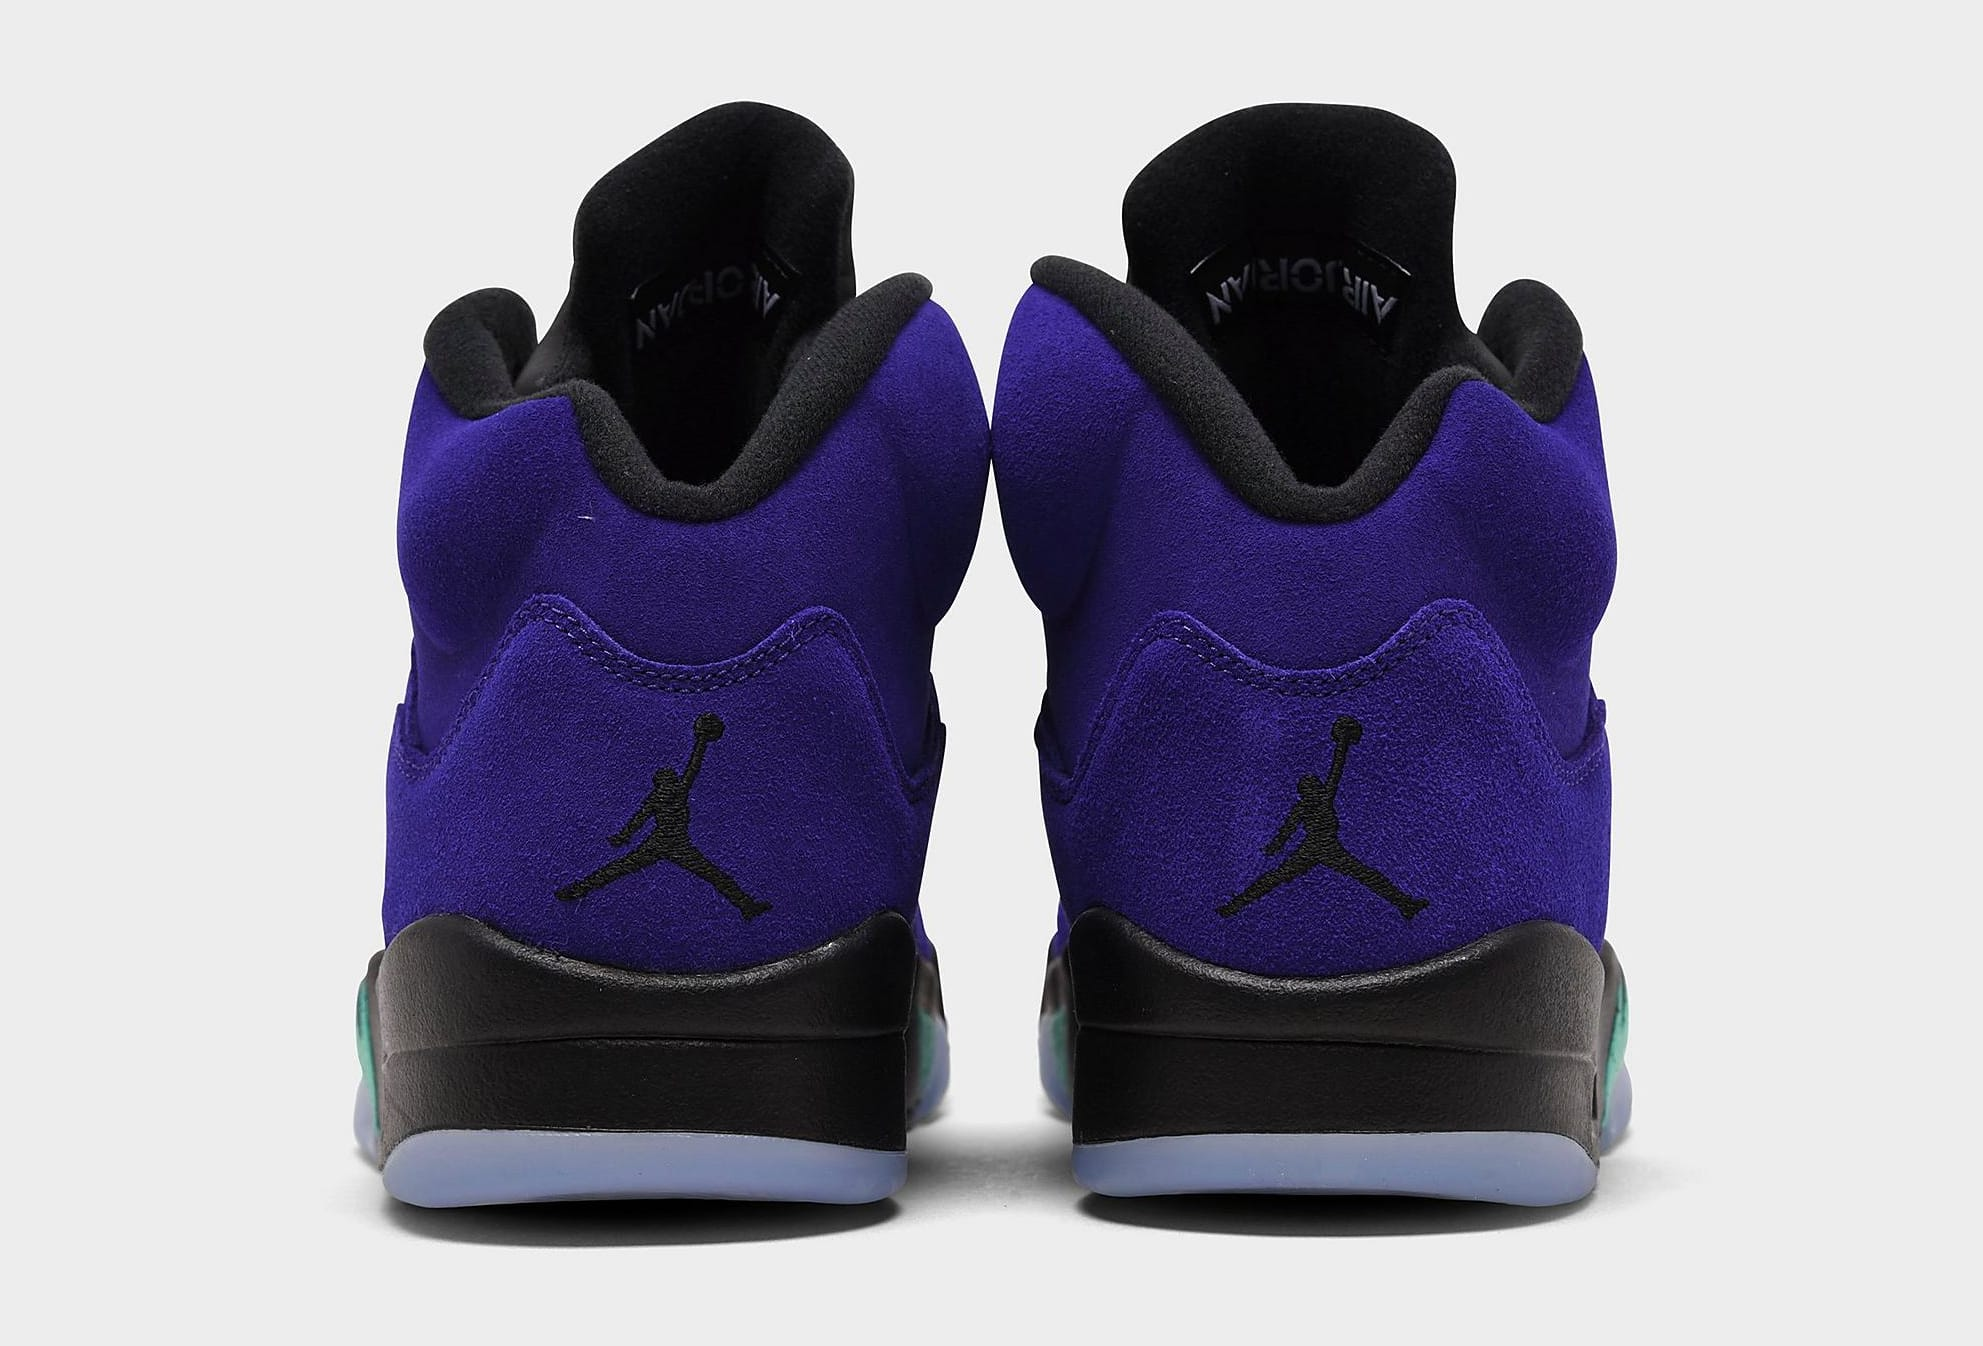 Air Jordan 5 Retro 'Alternate Grape' 136027-500 Heel